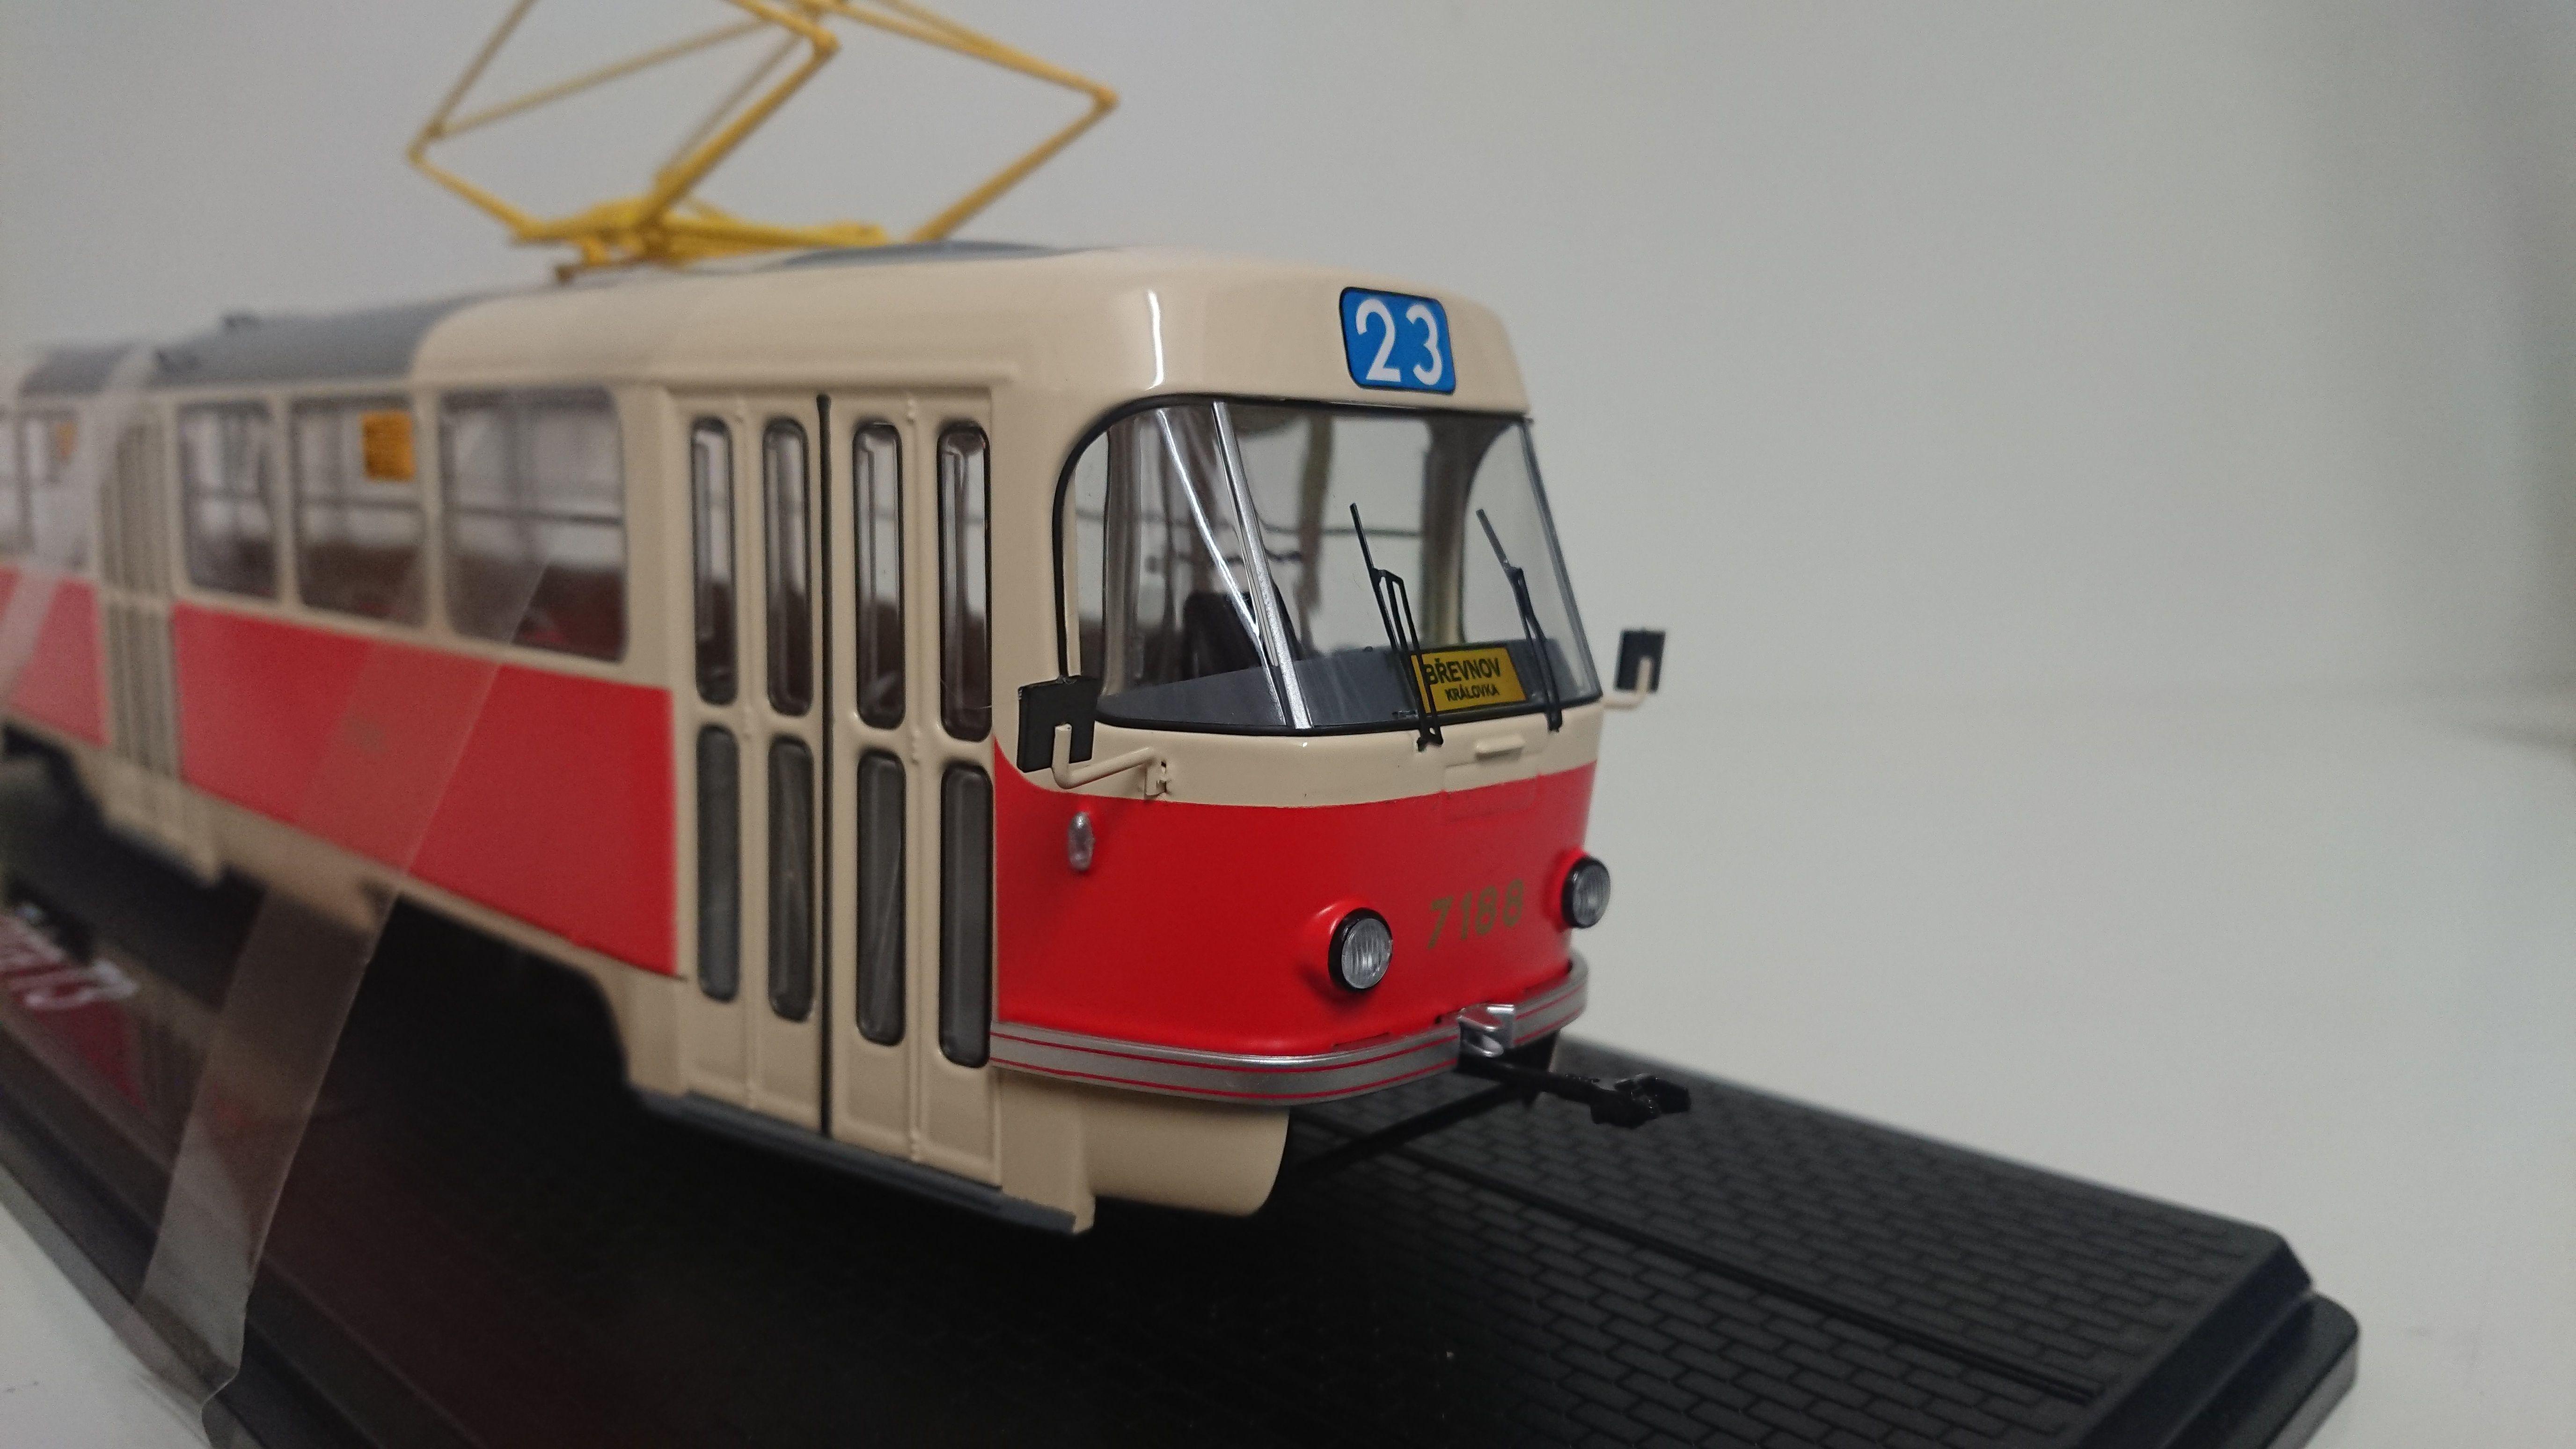 Macheta tramvai Tatra T3, scara 1:430